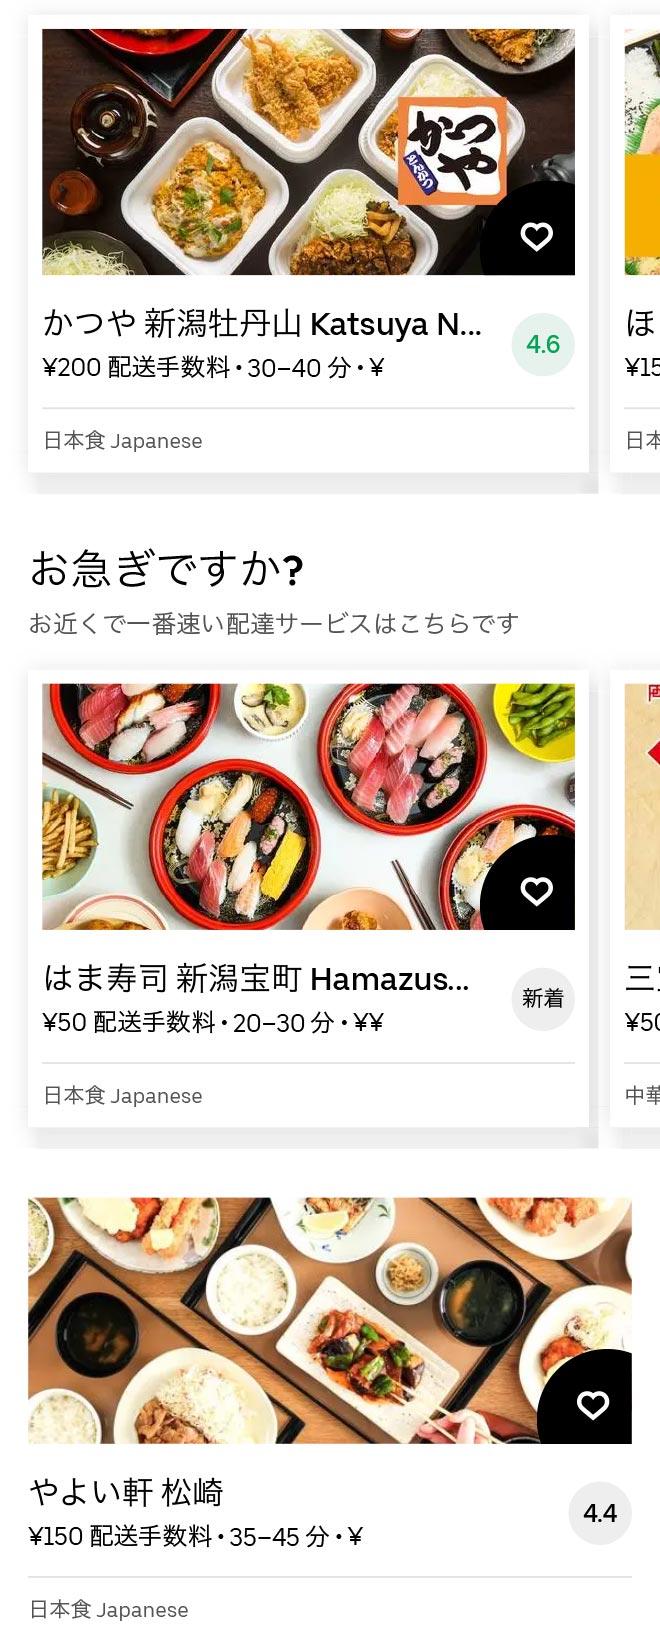 Koganemachi menu 2011 02